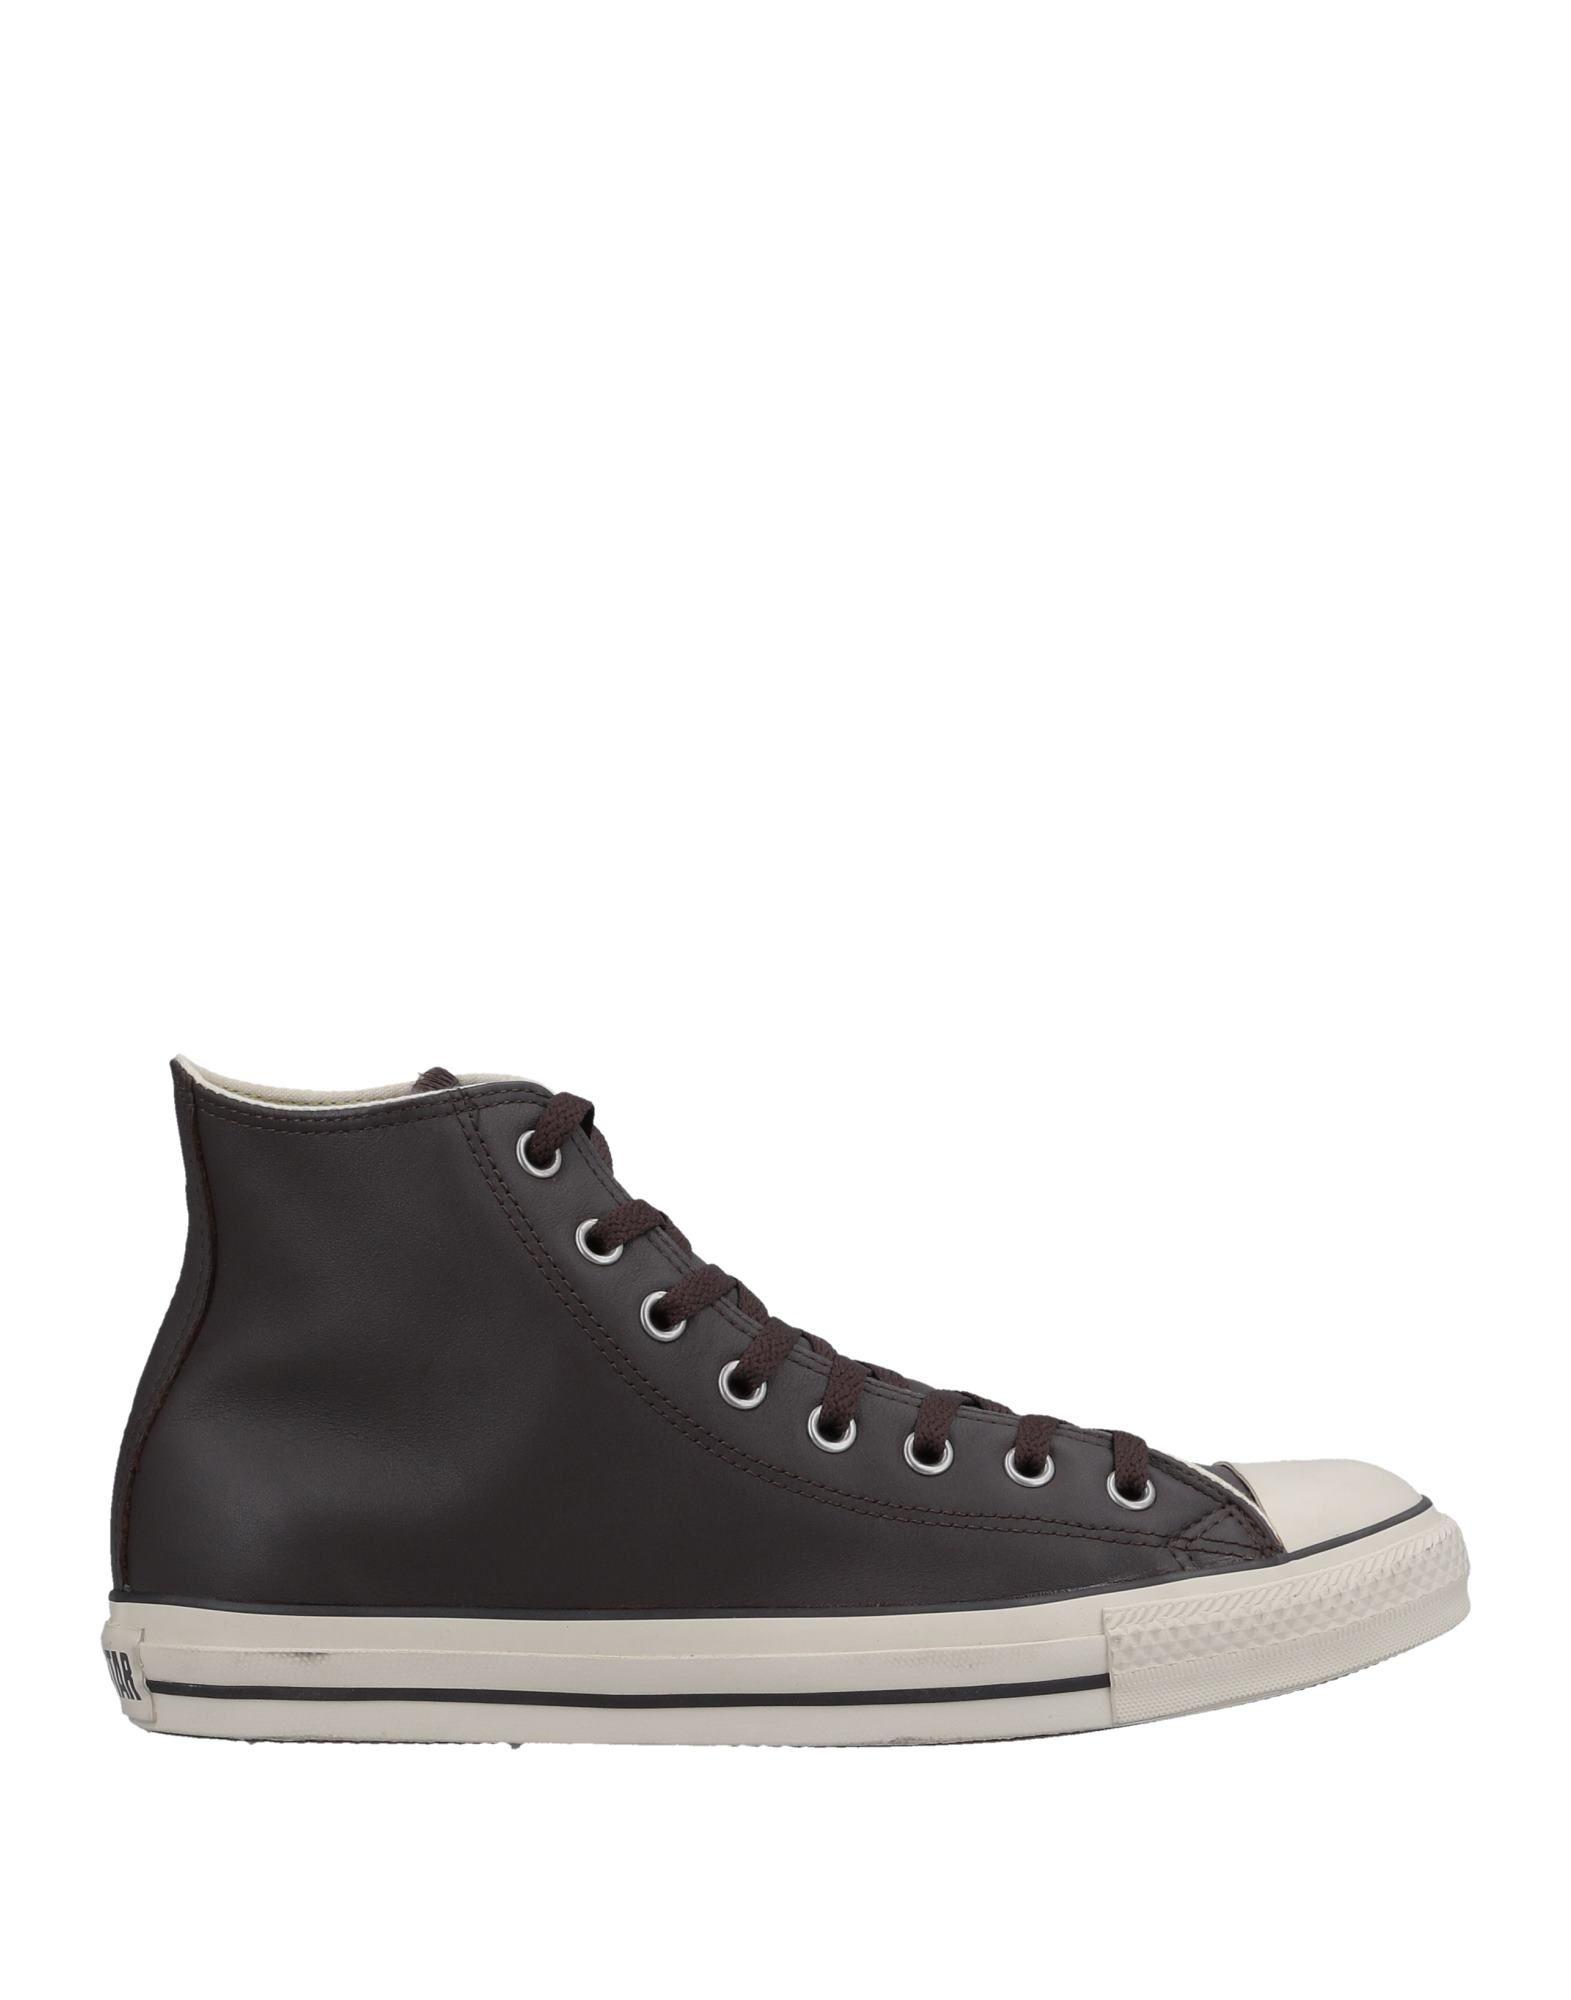 Converse All Star Sneakers Herren  11509964OD Neue Schuhe